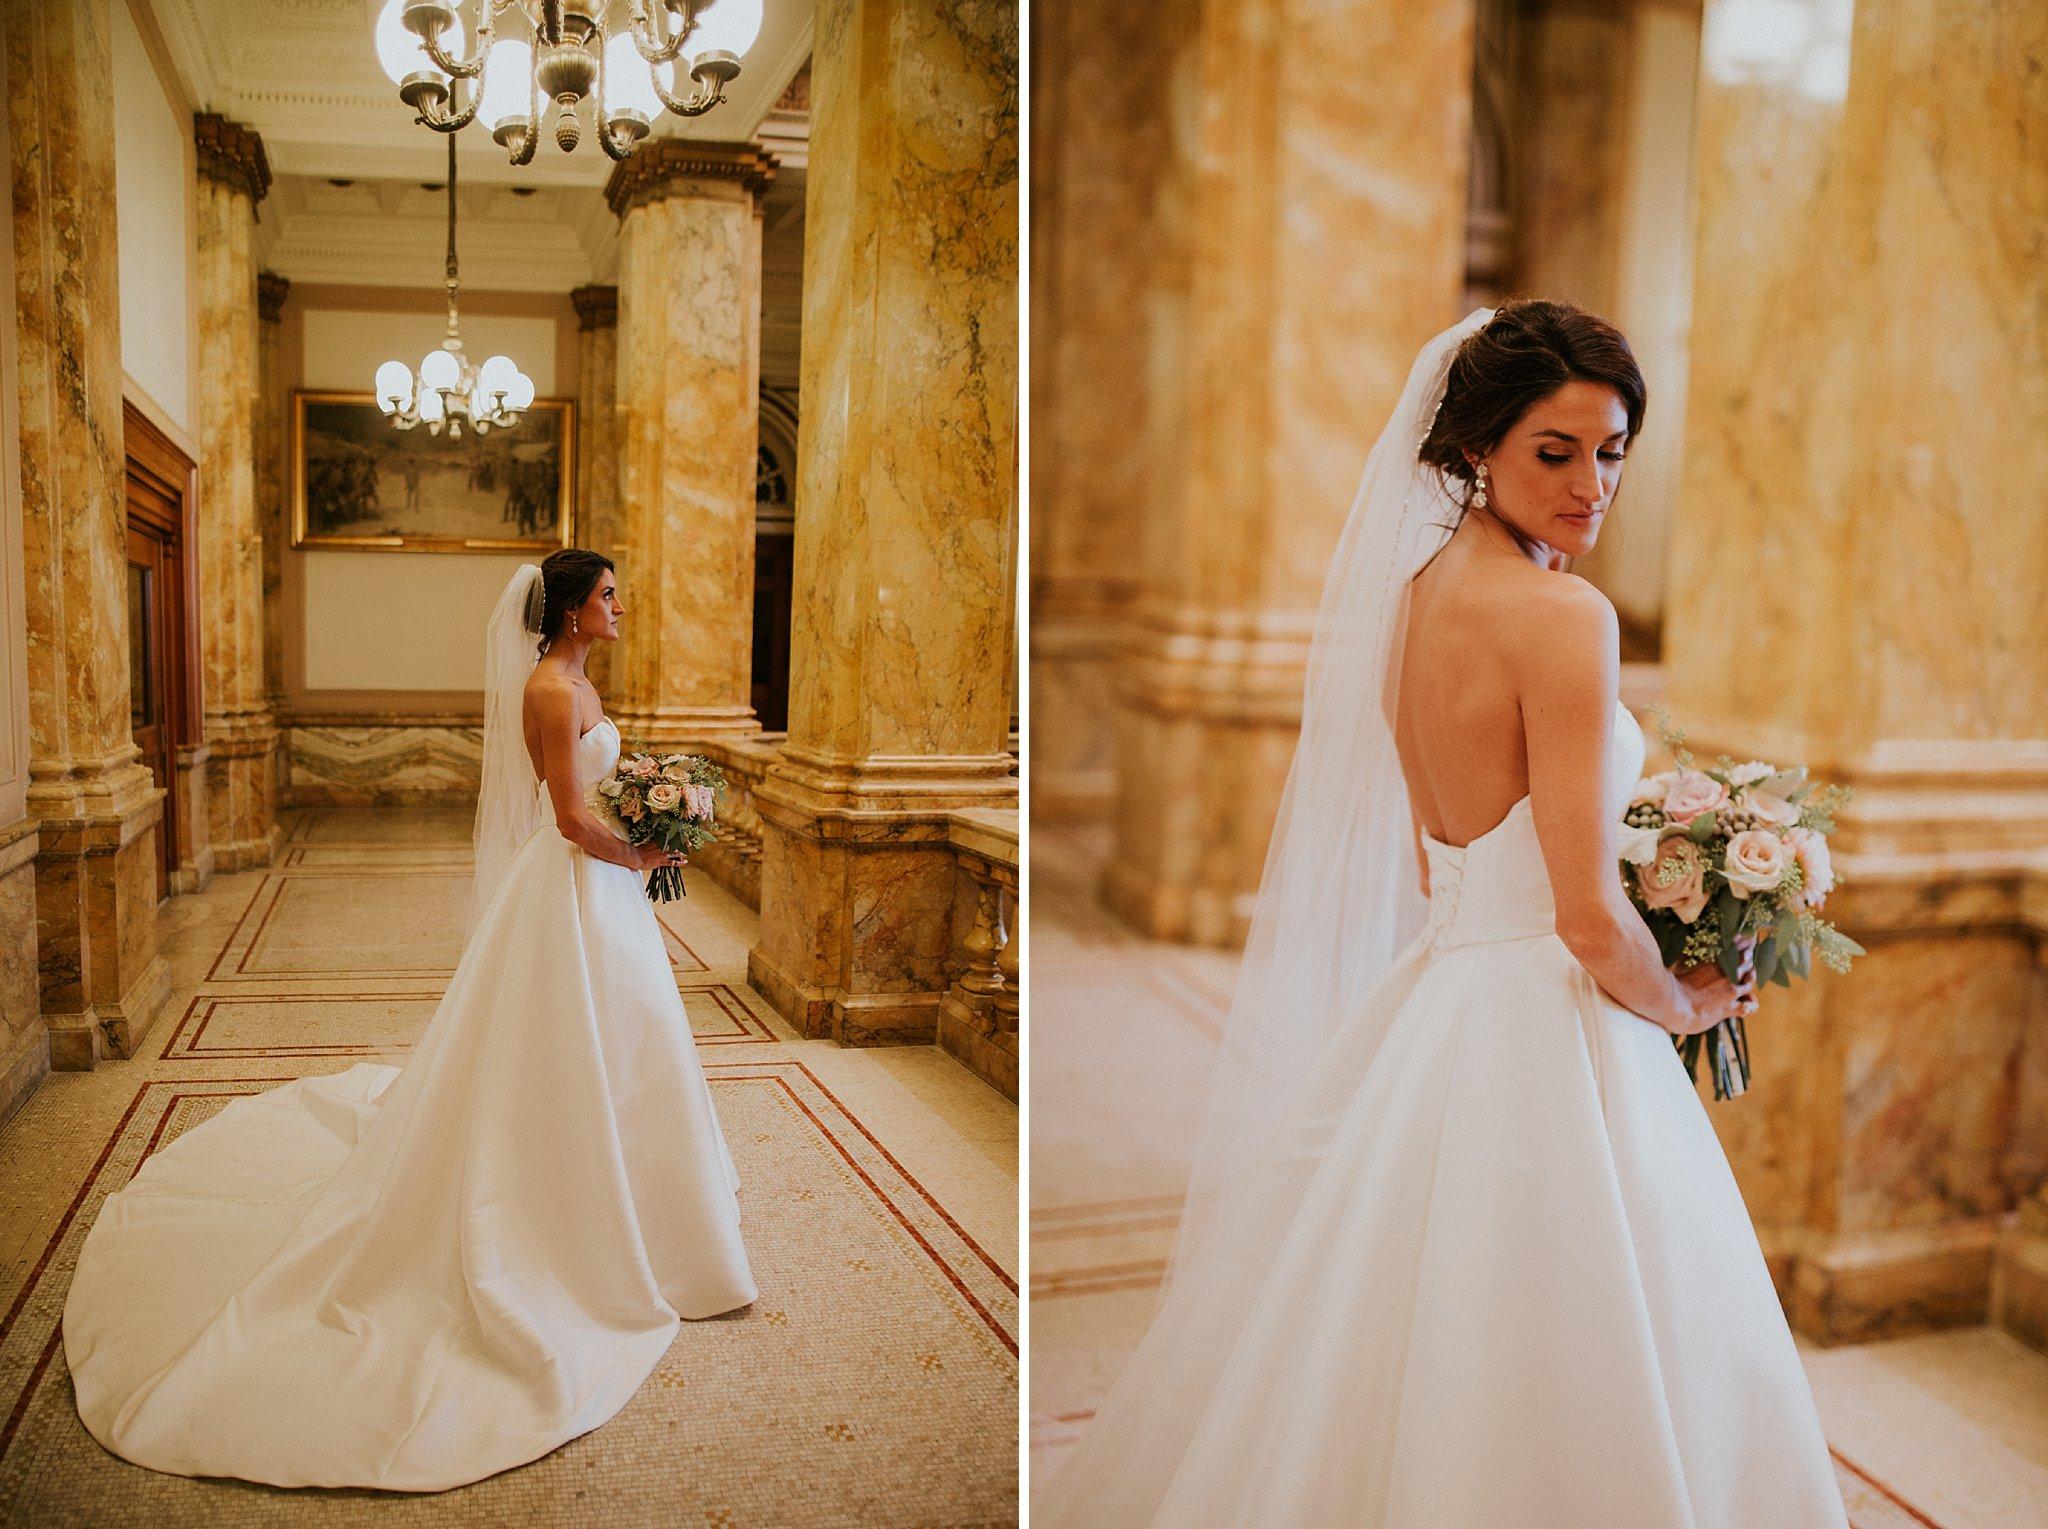 Matt-Lauren_St-Marys_Hilton-City-Center-Milwaukee-Wedding_liller-photo_0054.jpg